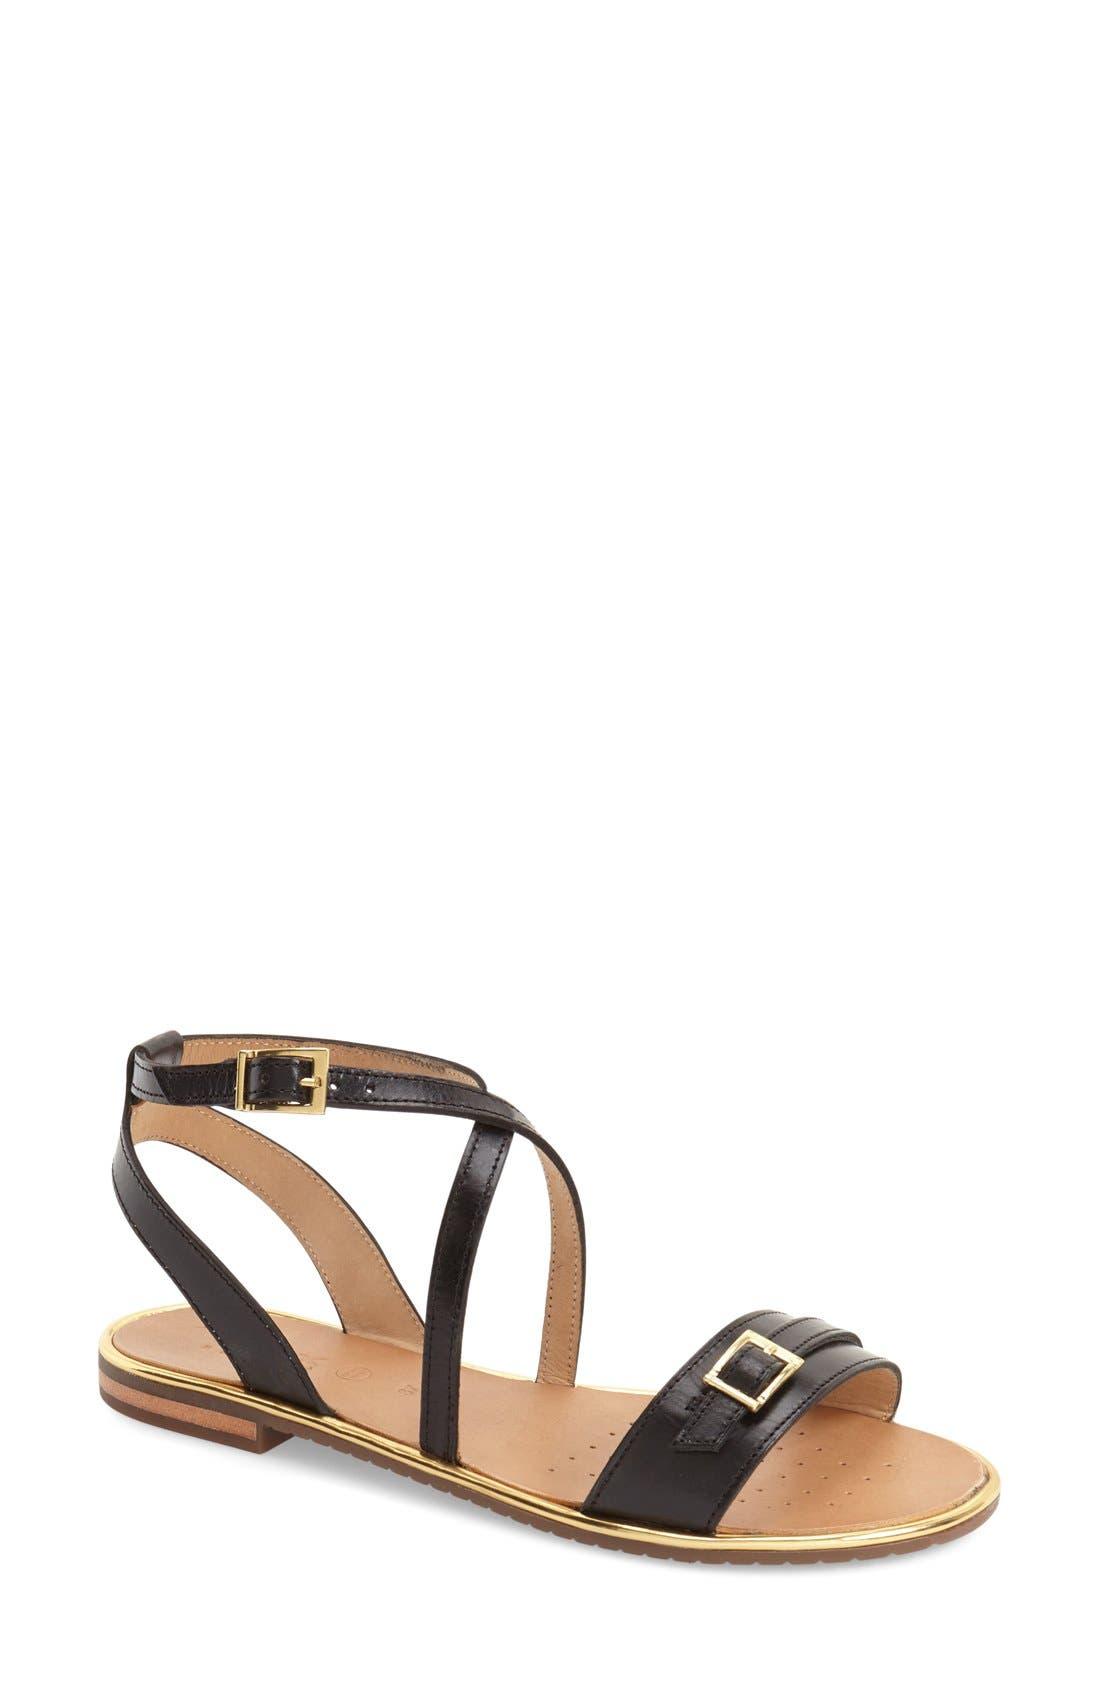 'Sozy' Sandal,                         Main,                         color, 001